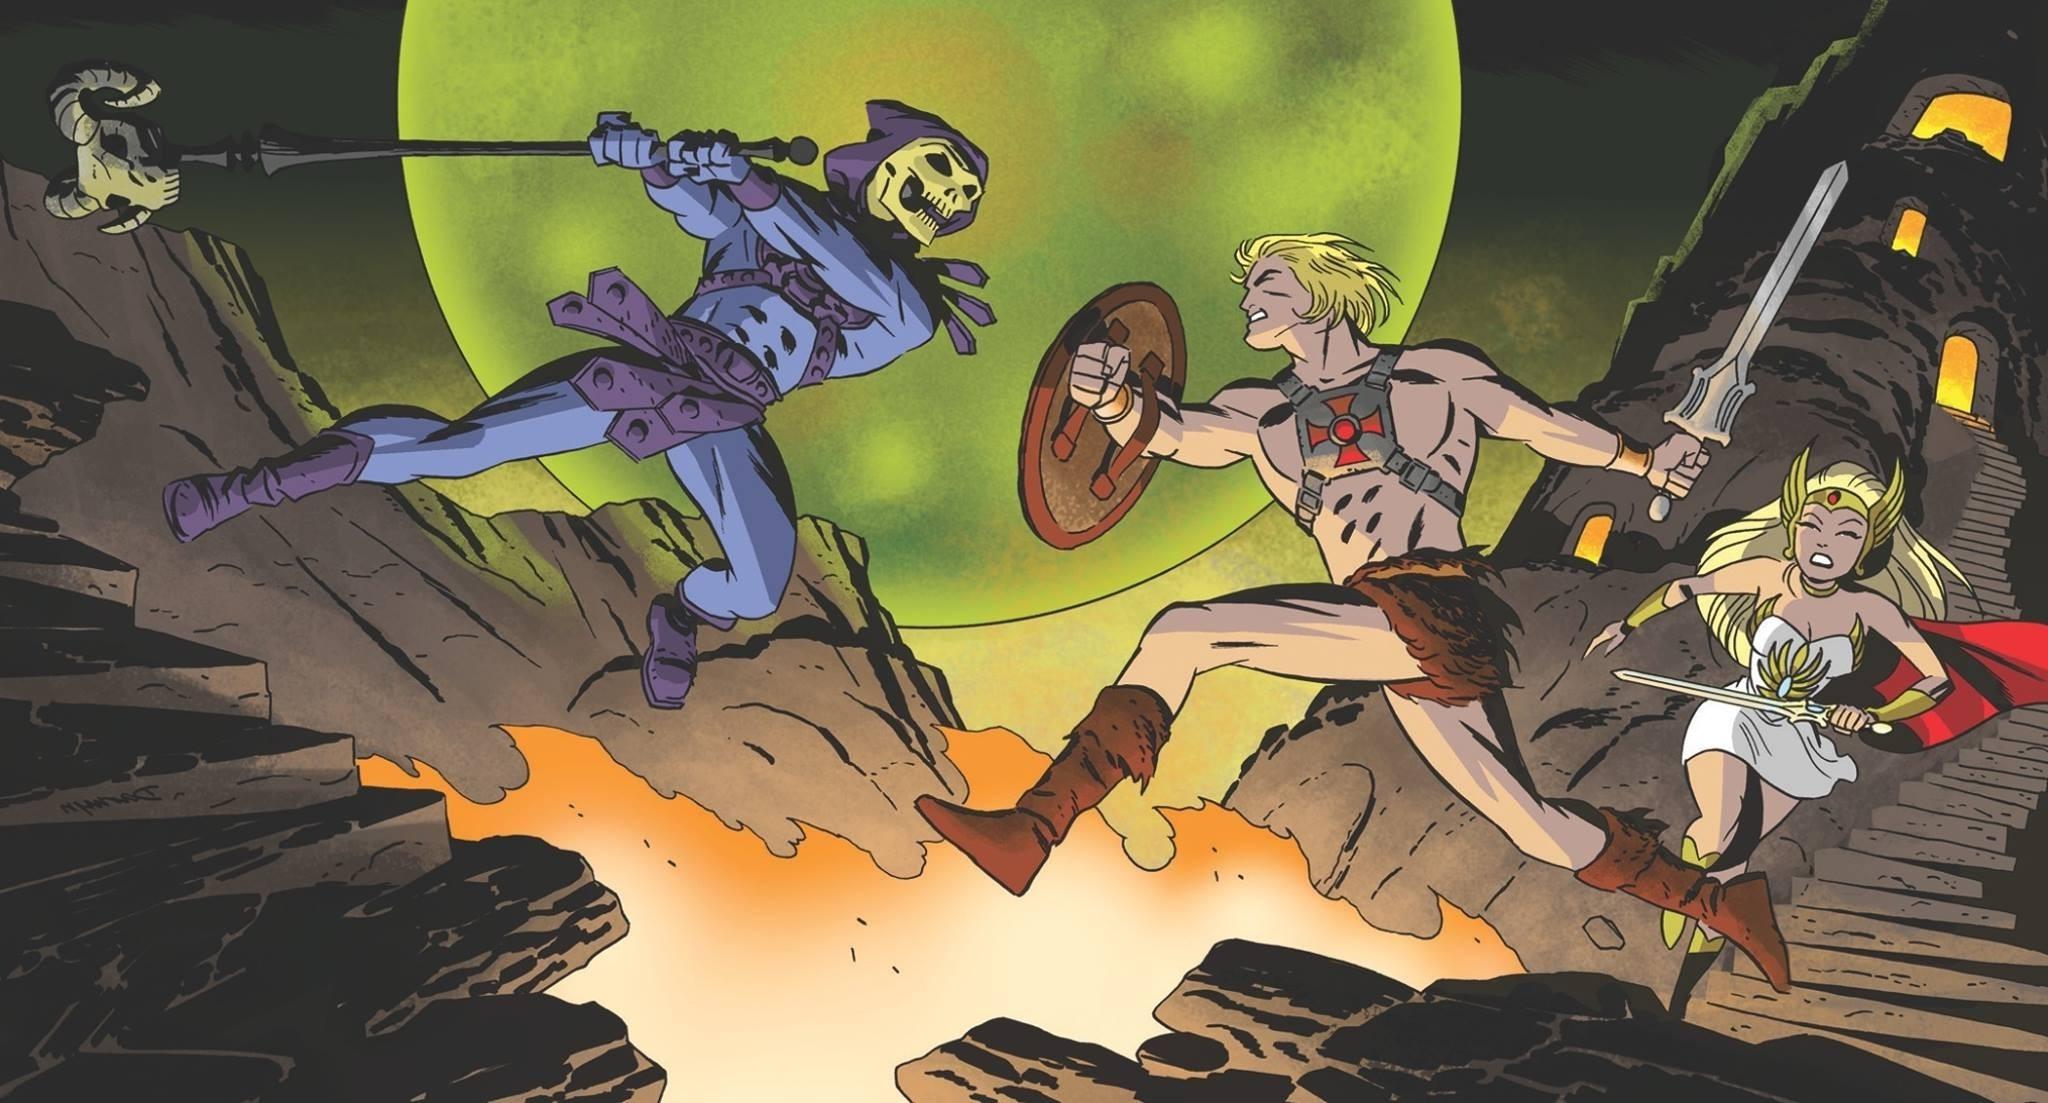 He Man, Skeletor, Comics Wallpapers HD / Desktop and Mobile Backgrounds